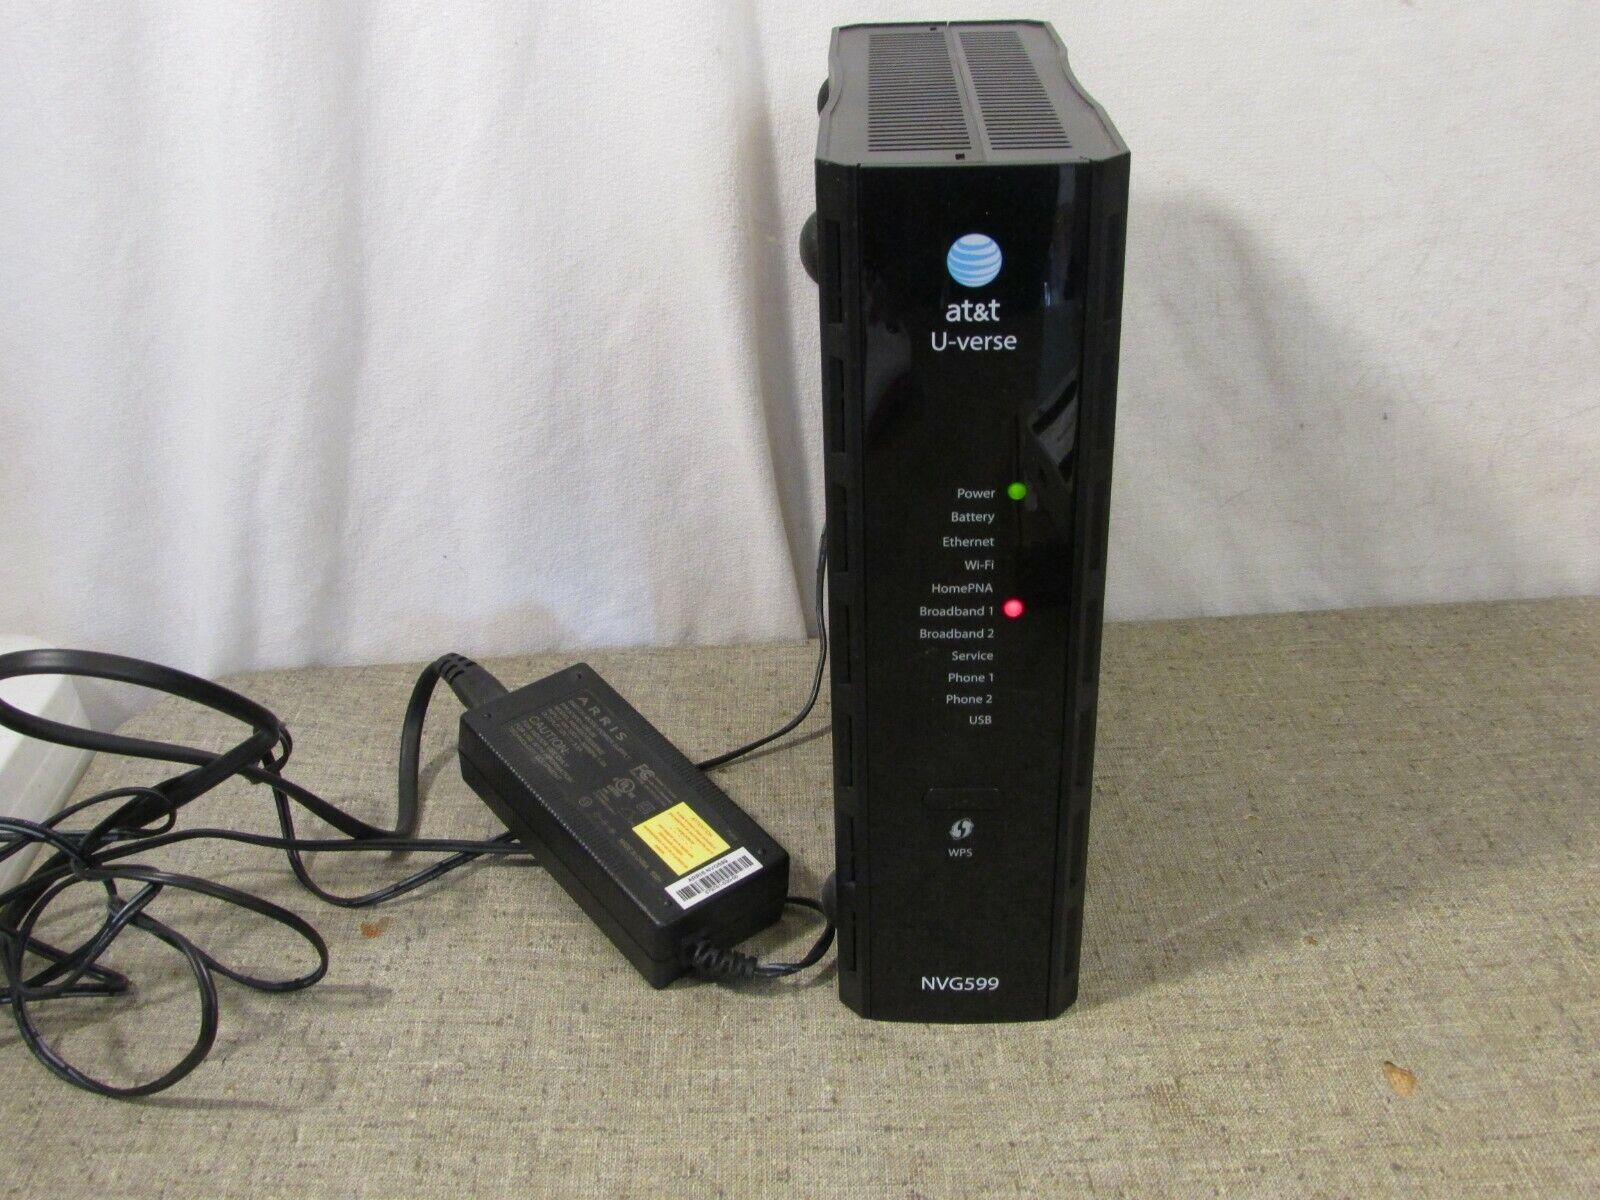 At T Uverse Arris Motorola Nvg599 Gateway Modem Att Router For Sale Online Ebay